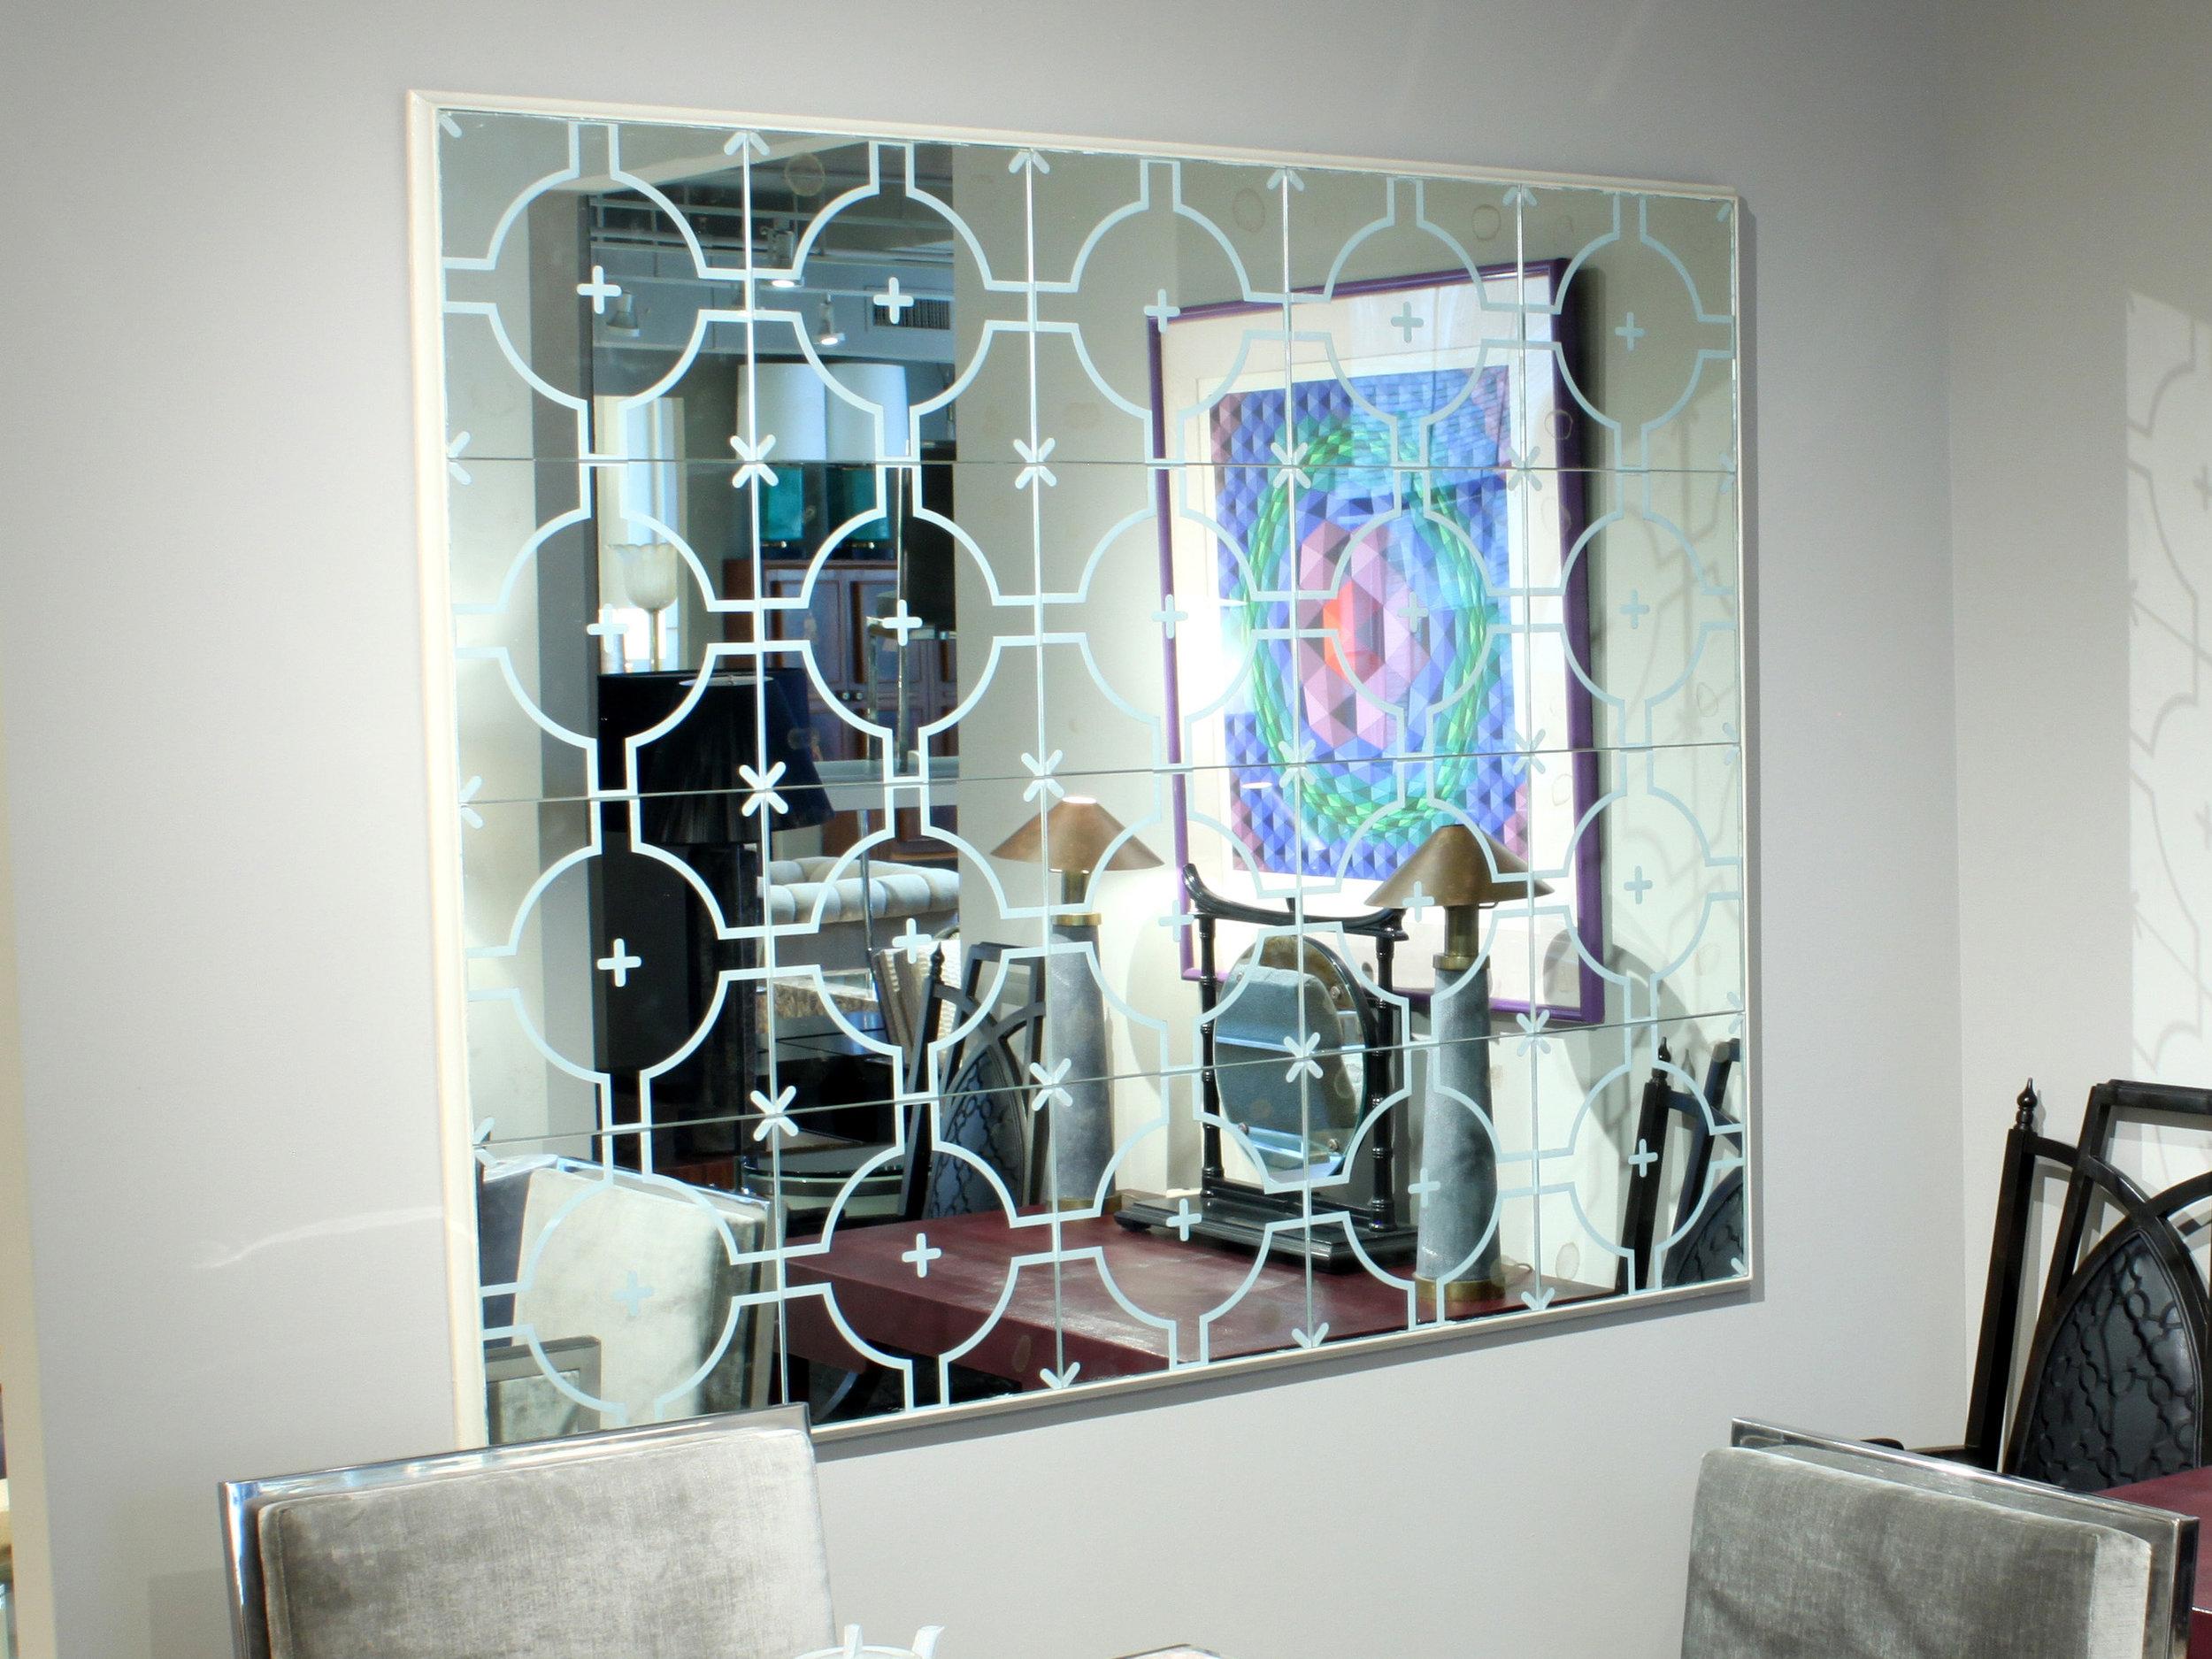 Parzinger 85 lrg geomtric mirror144 environmental.jpg